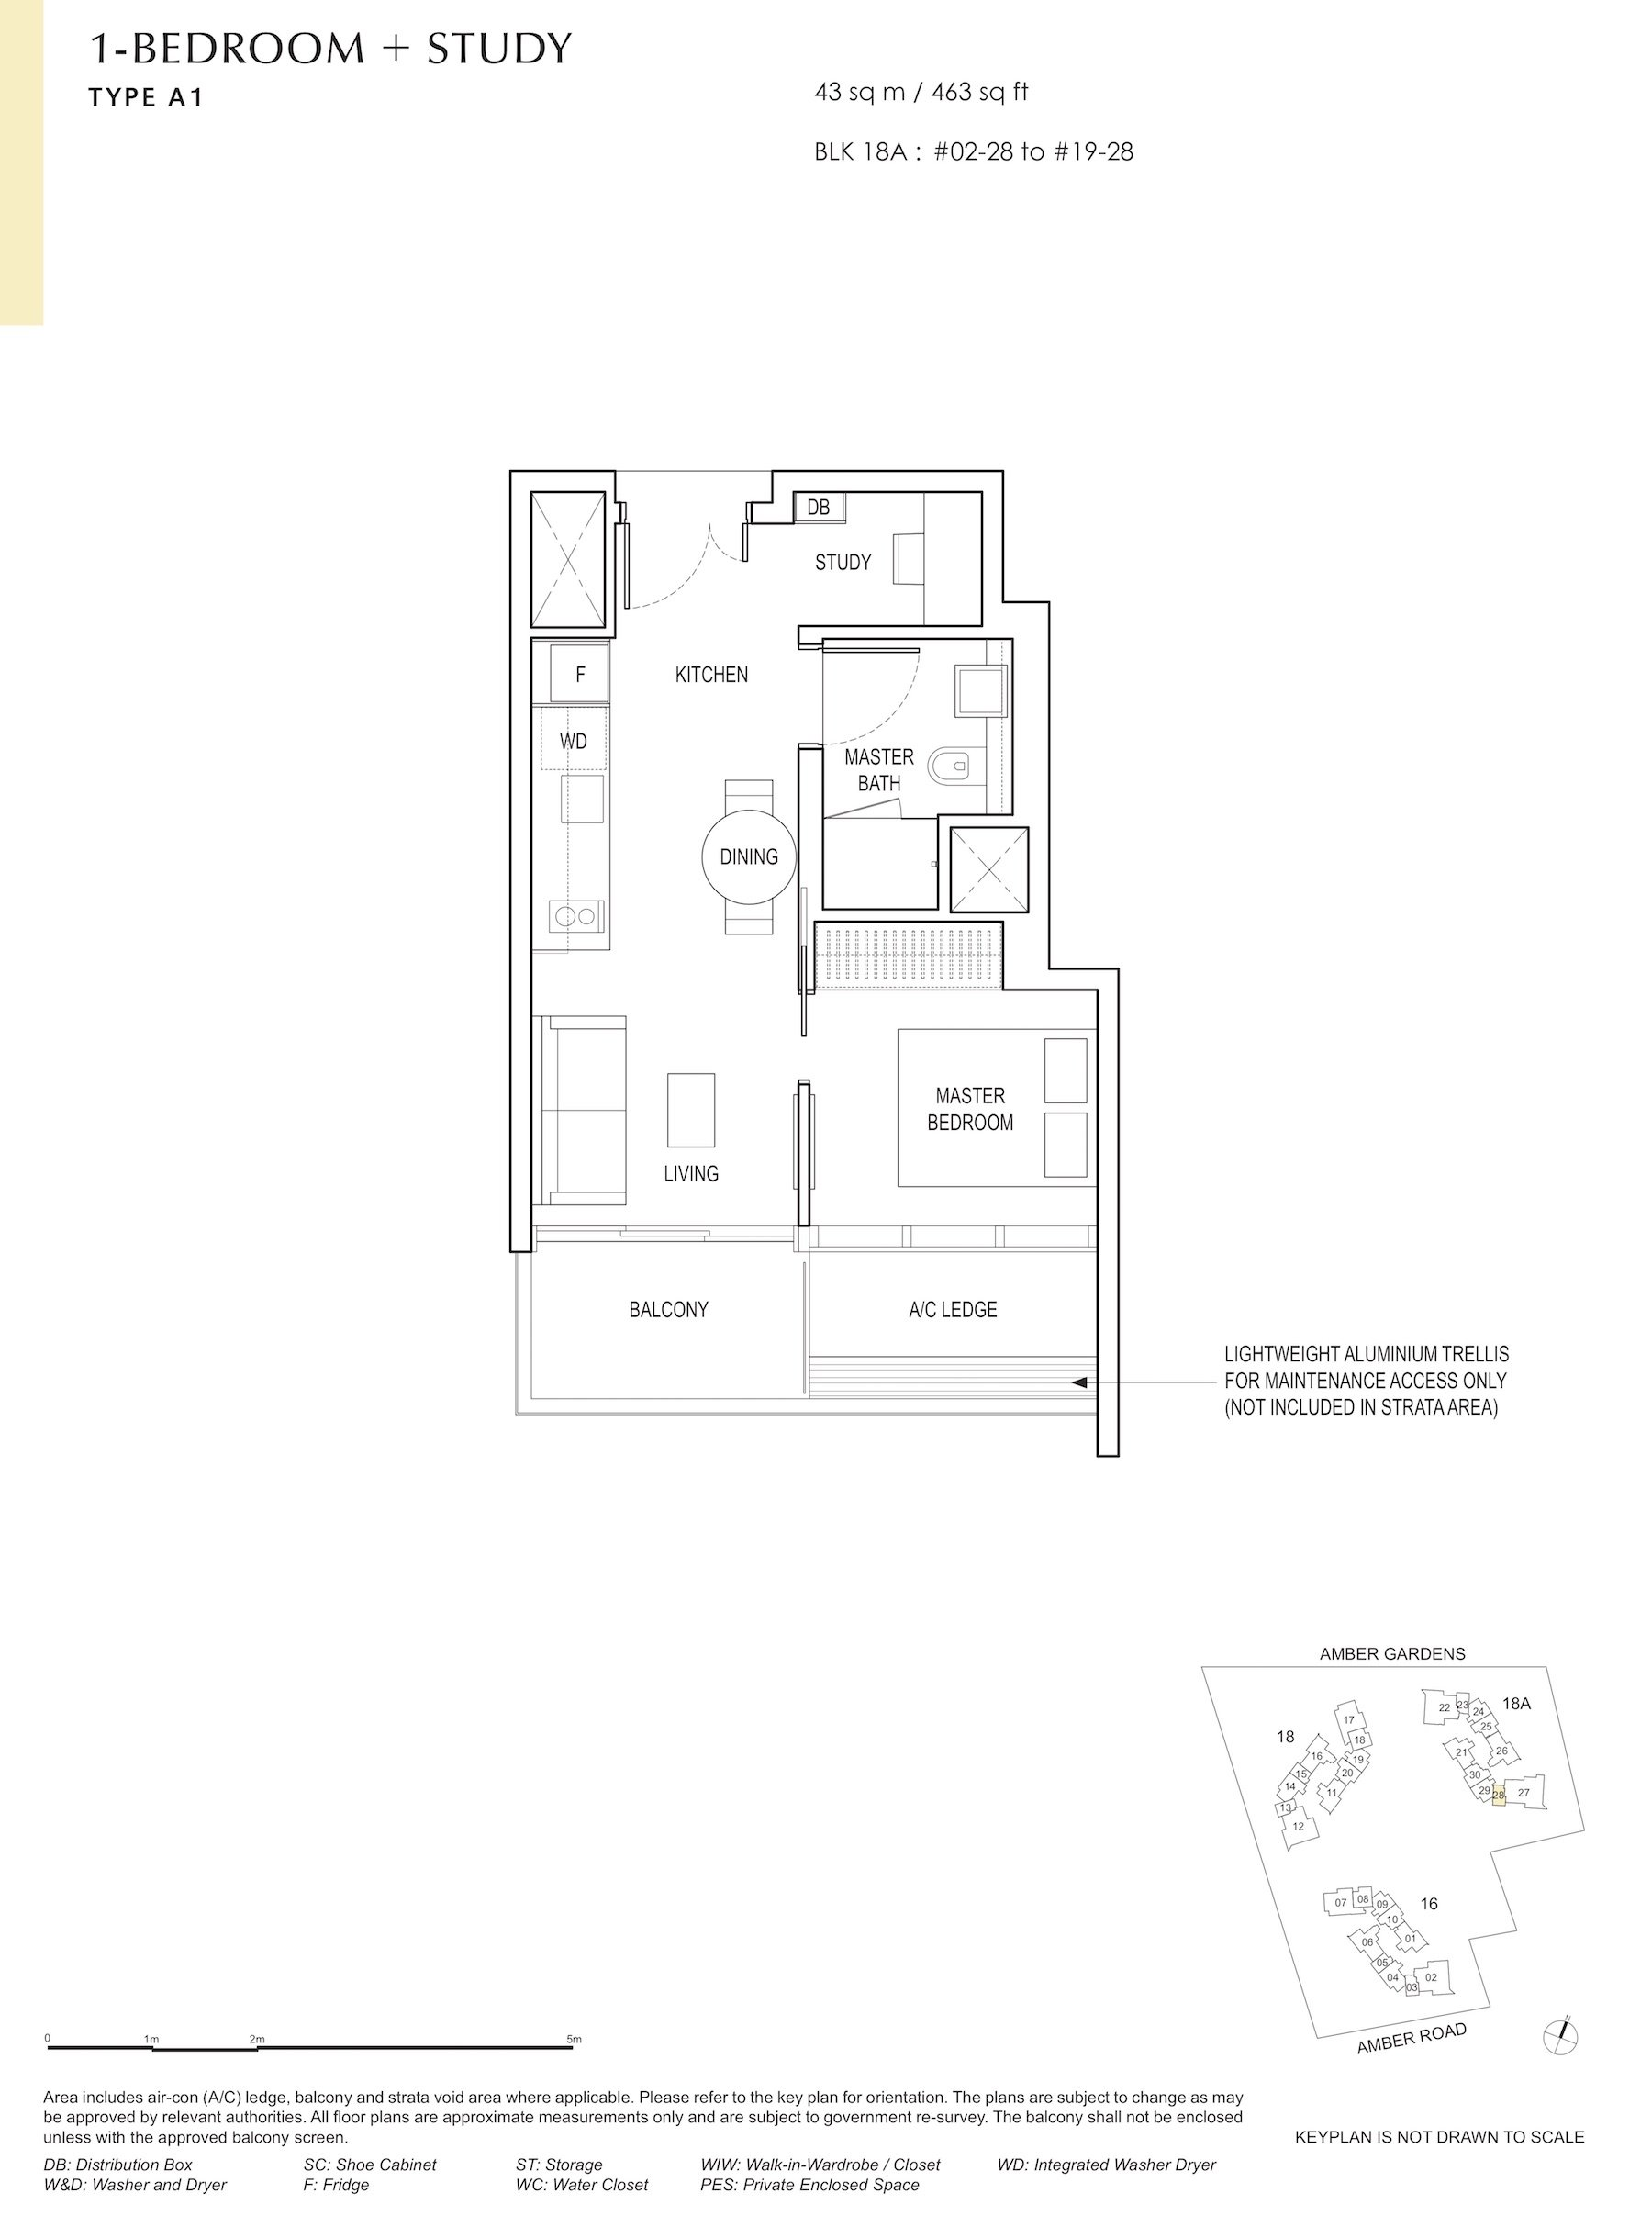 Amber Park 安铂苑 floor plan 1 bedroom + study 1卧房+书房 A1